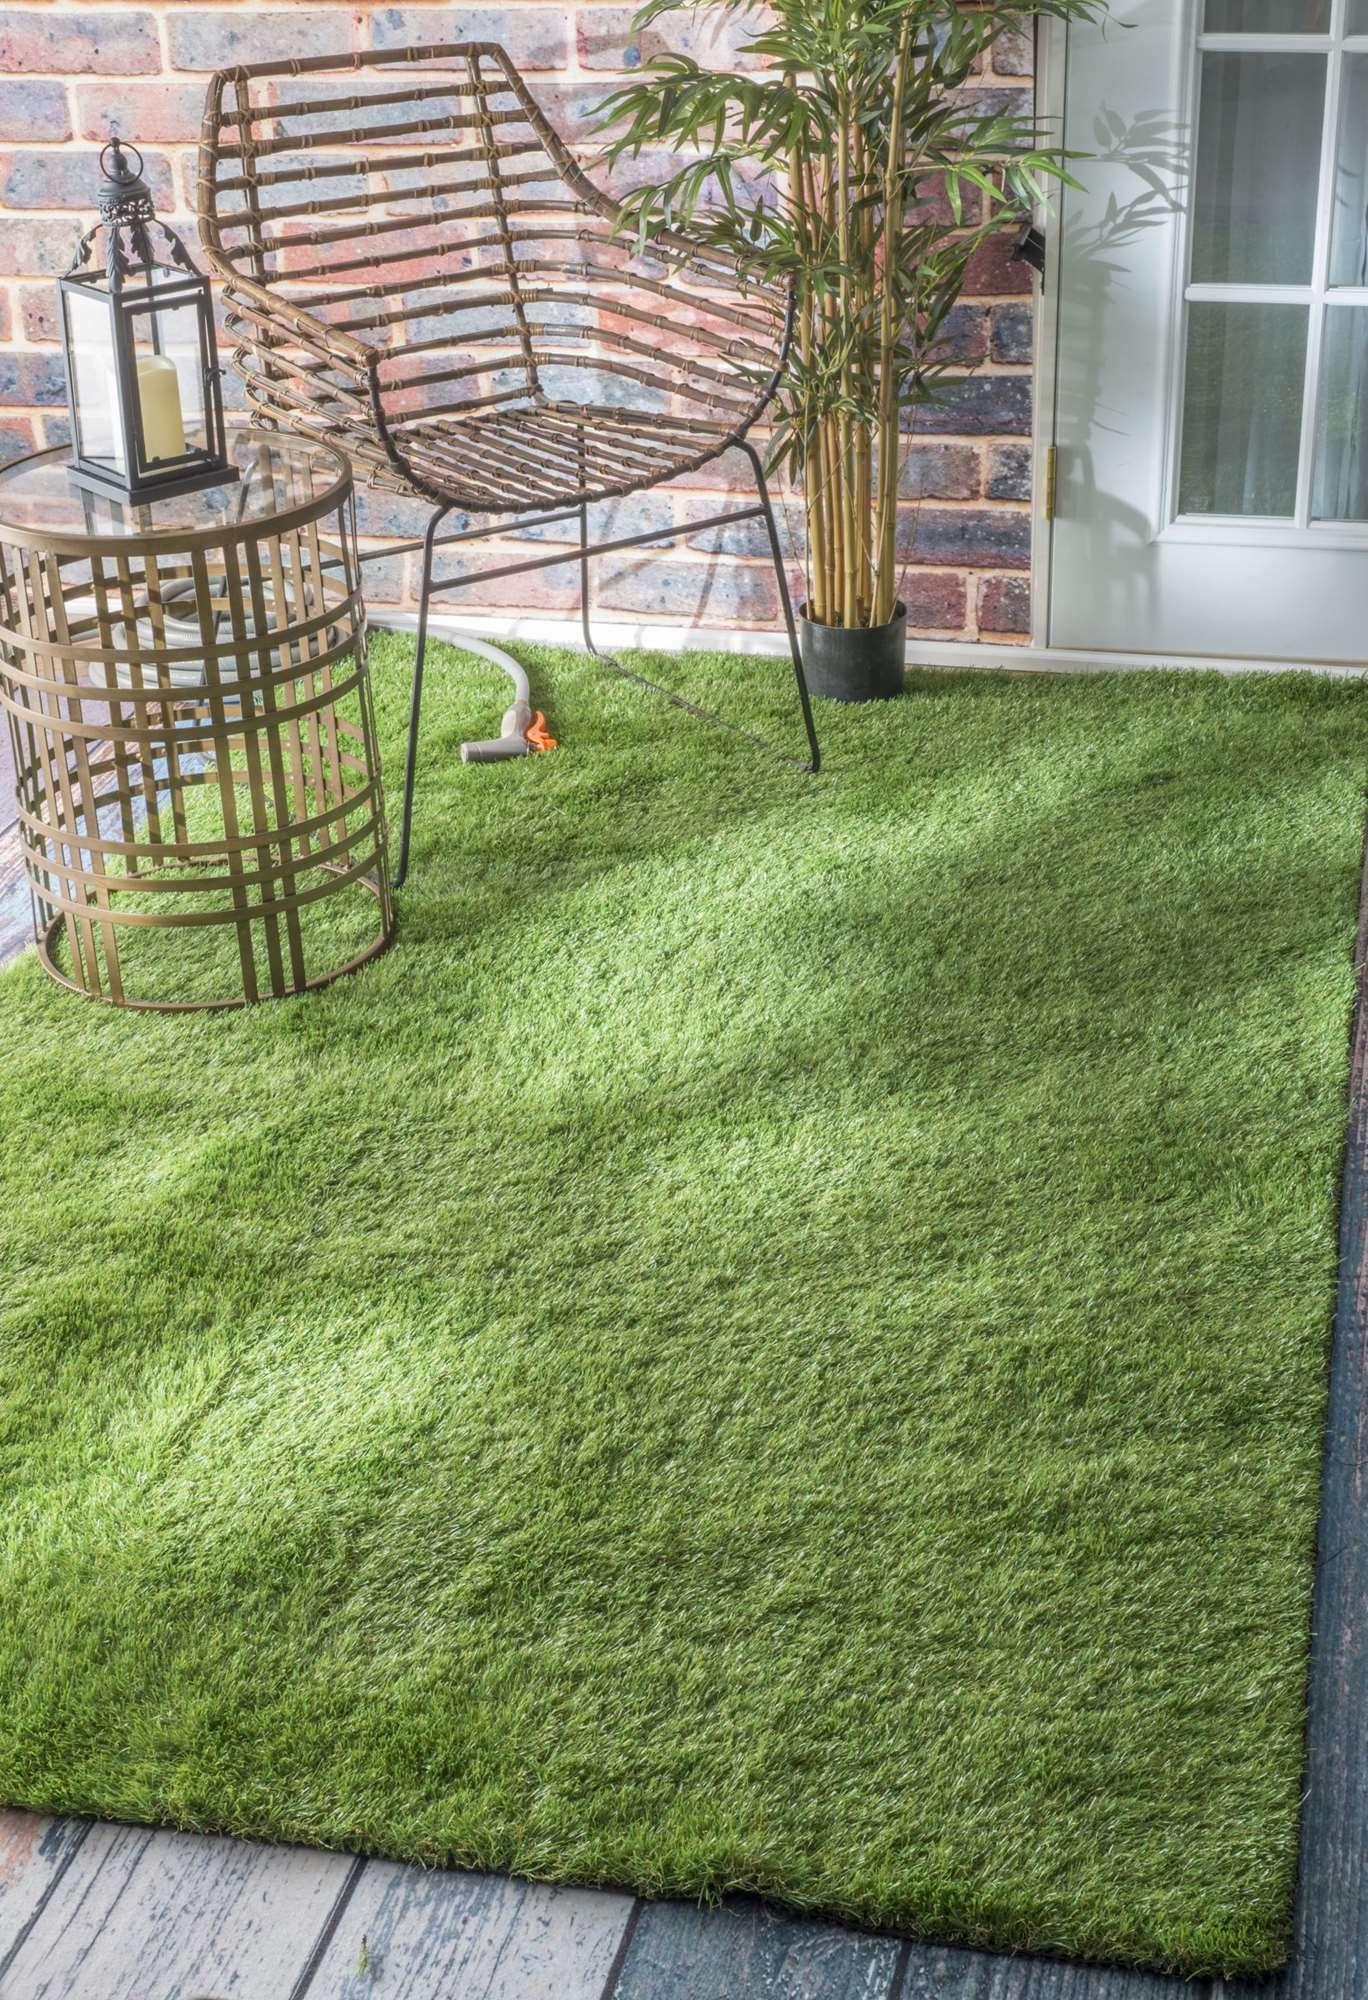 GerardiArtificial Grass Turf Rug